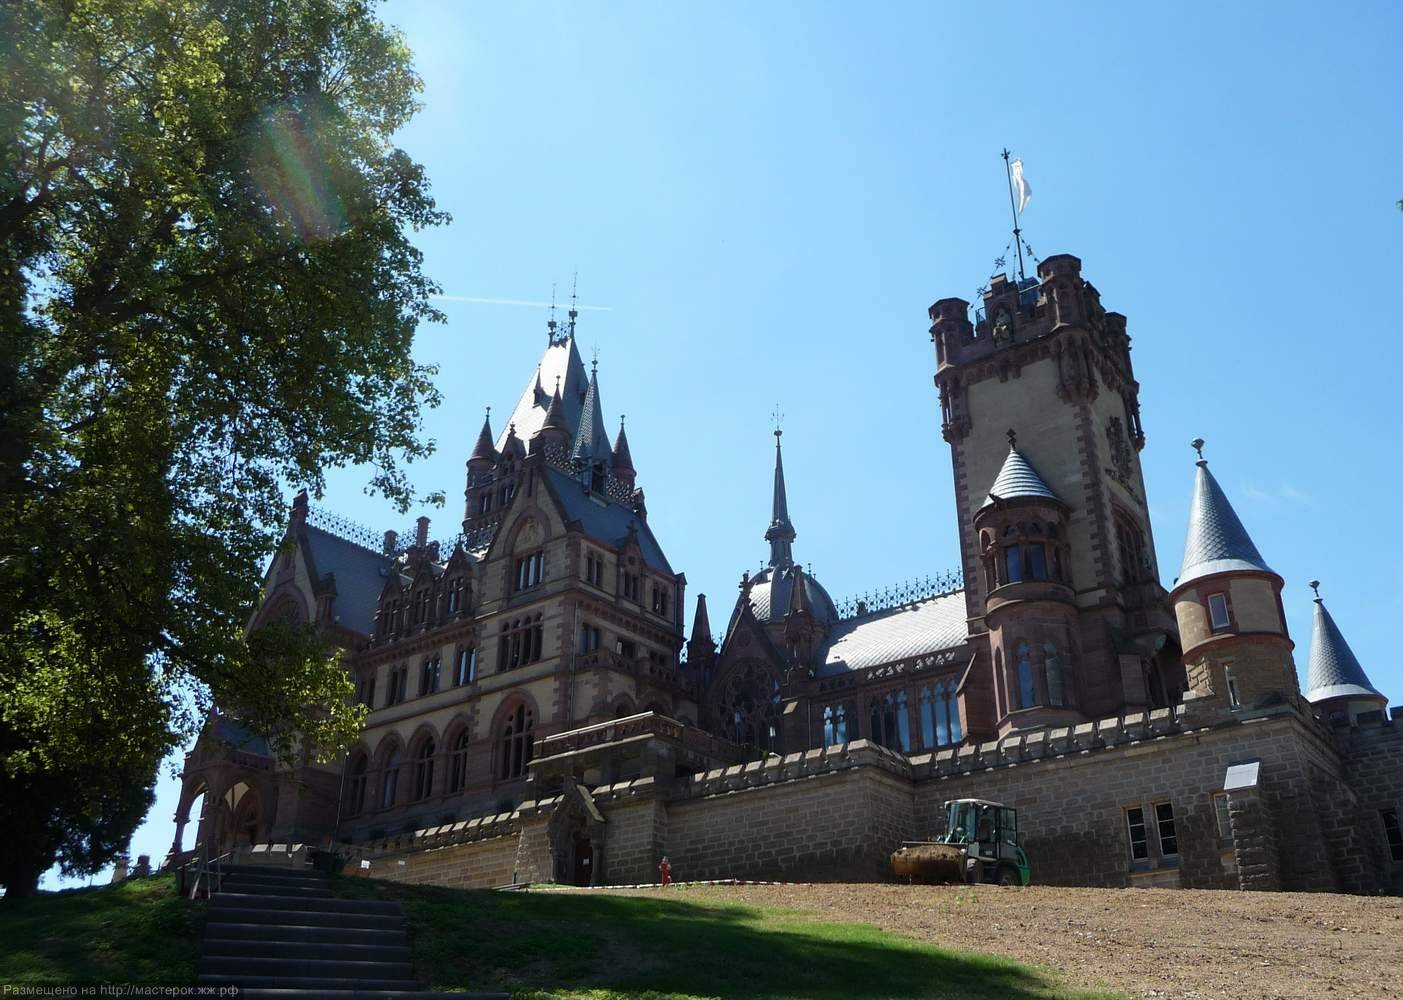 Замок драхенбург (schloss drachenburg) - замки германии